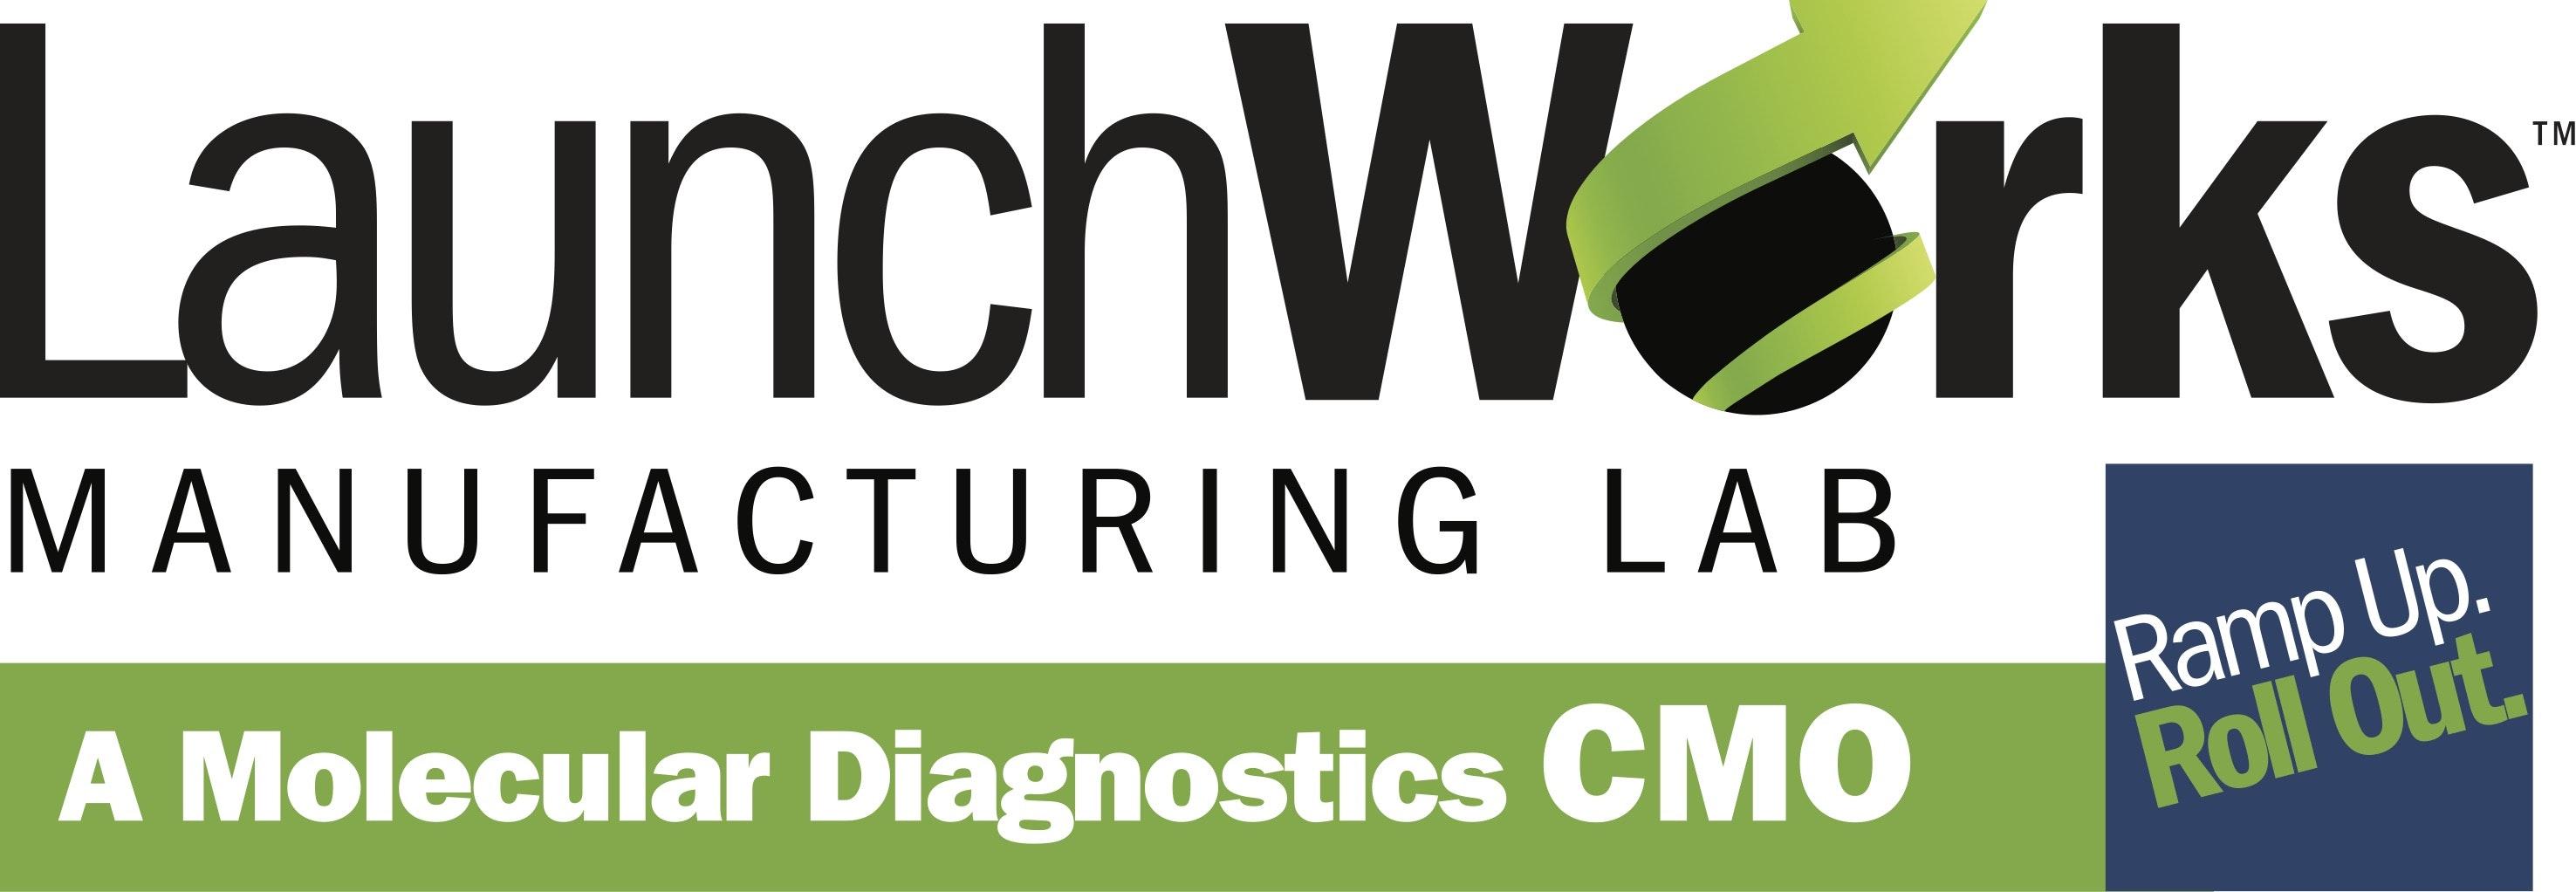 LaunchWorks Manufacturing Lab Lab / Facility Logo